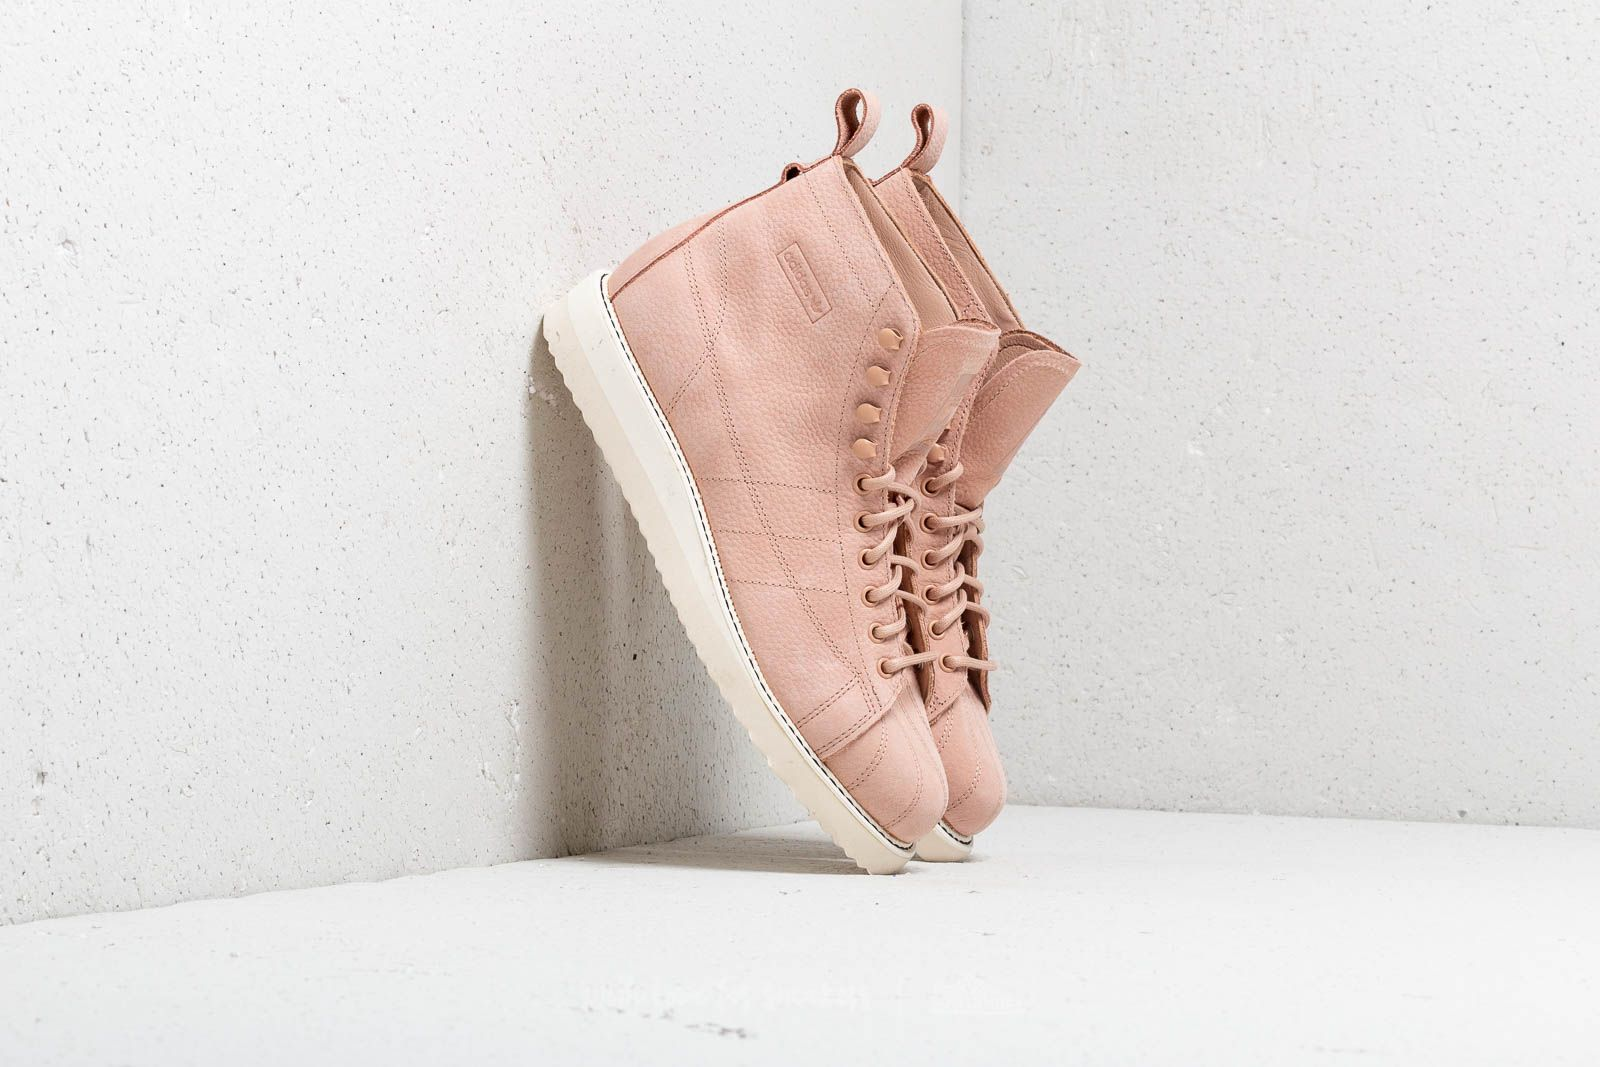 adidas Superstar Boot W Ash Pearl/ Ash Pearl/ Off White za skvělou cenu 2 490 Kč koupíte na Footshop.cz